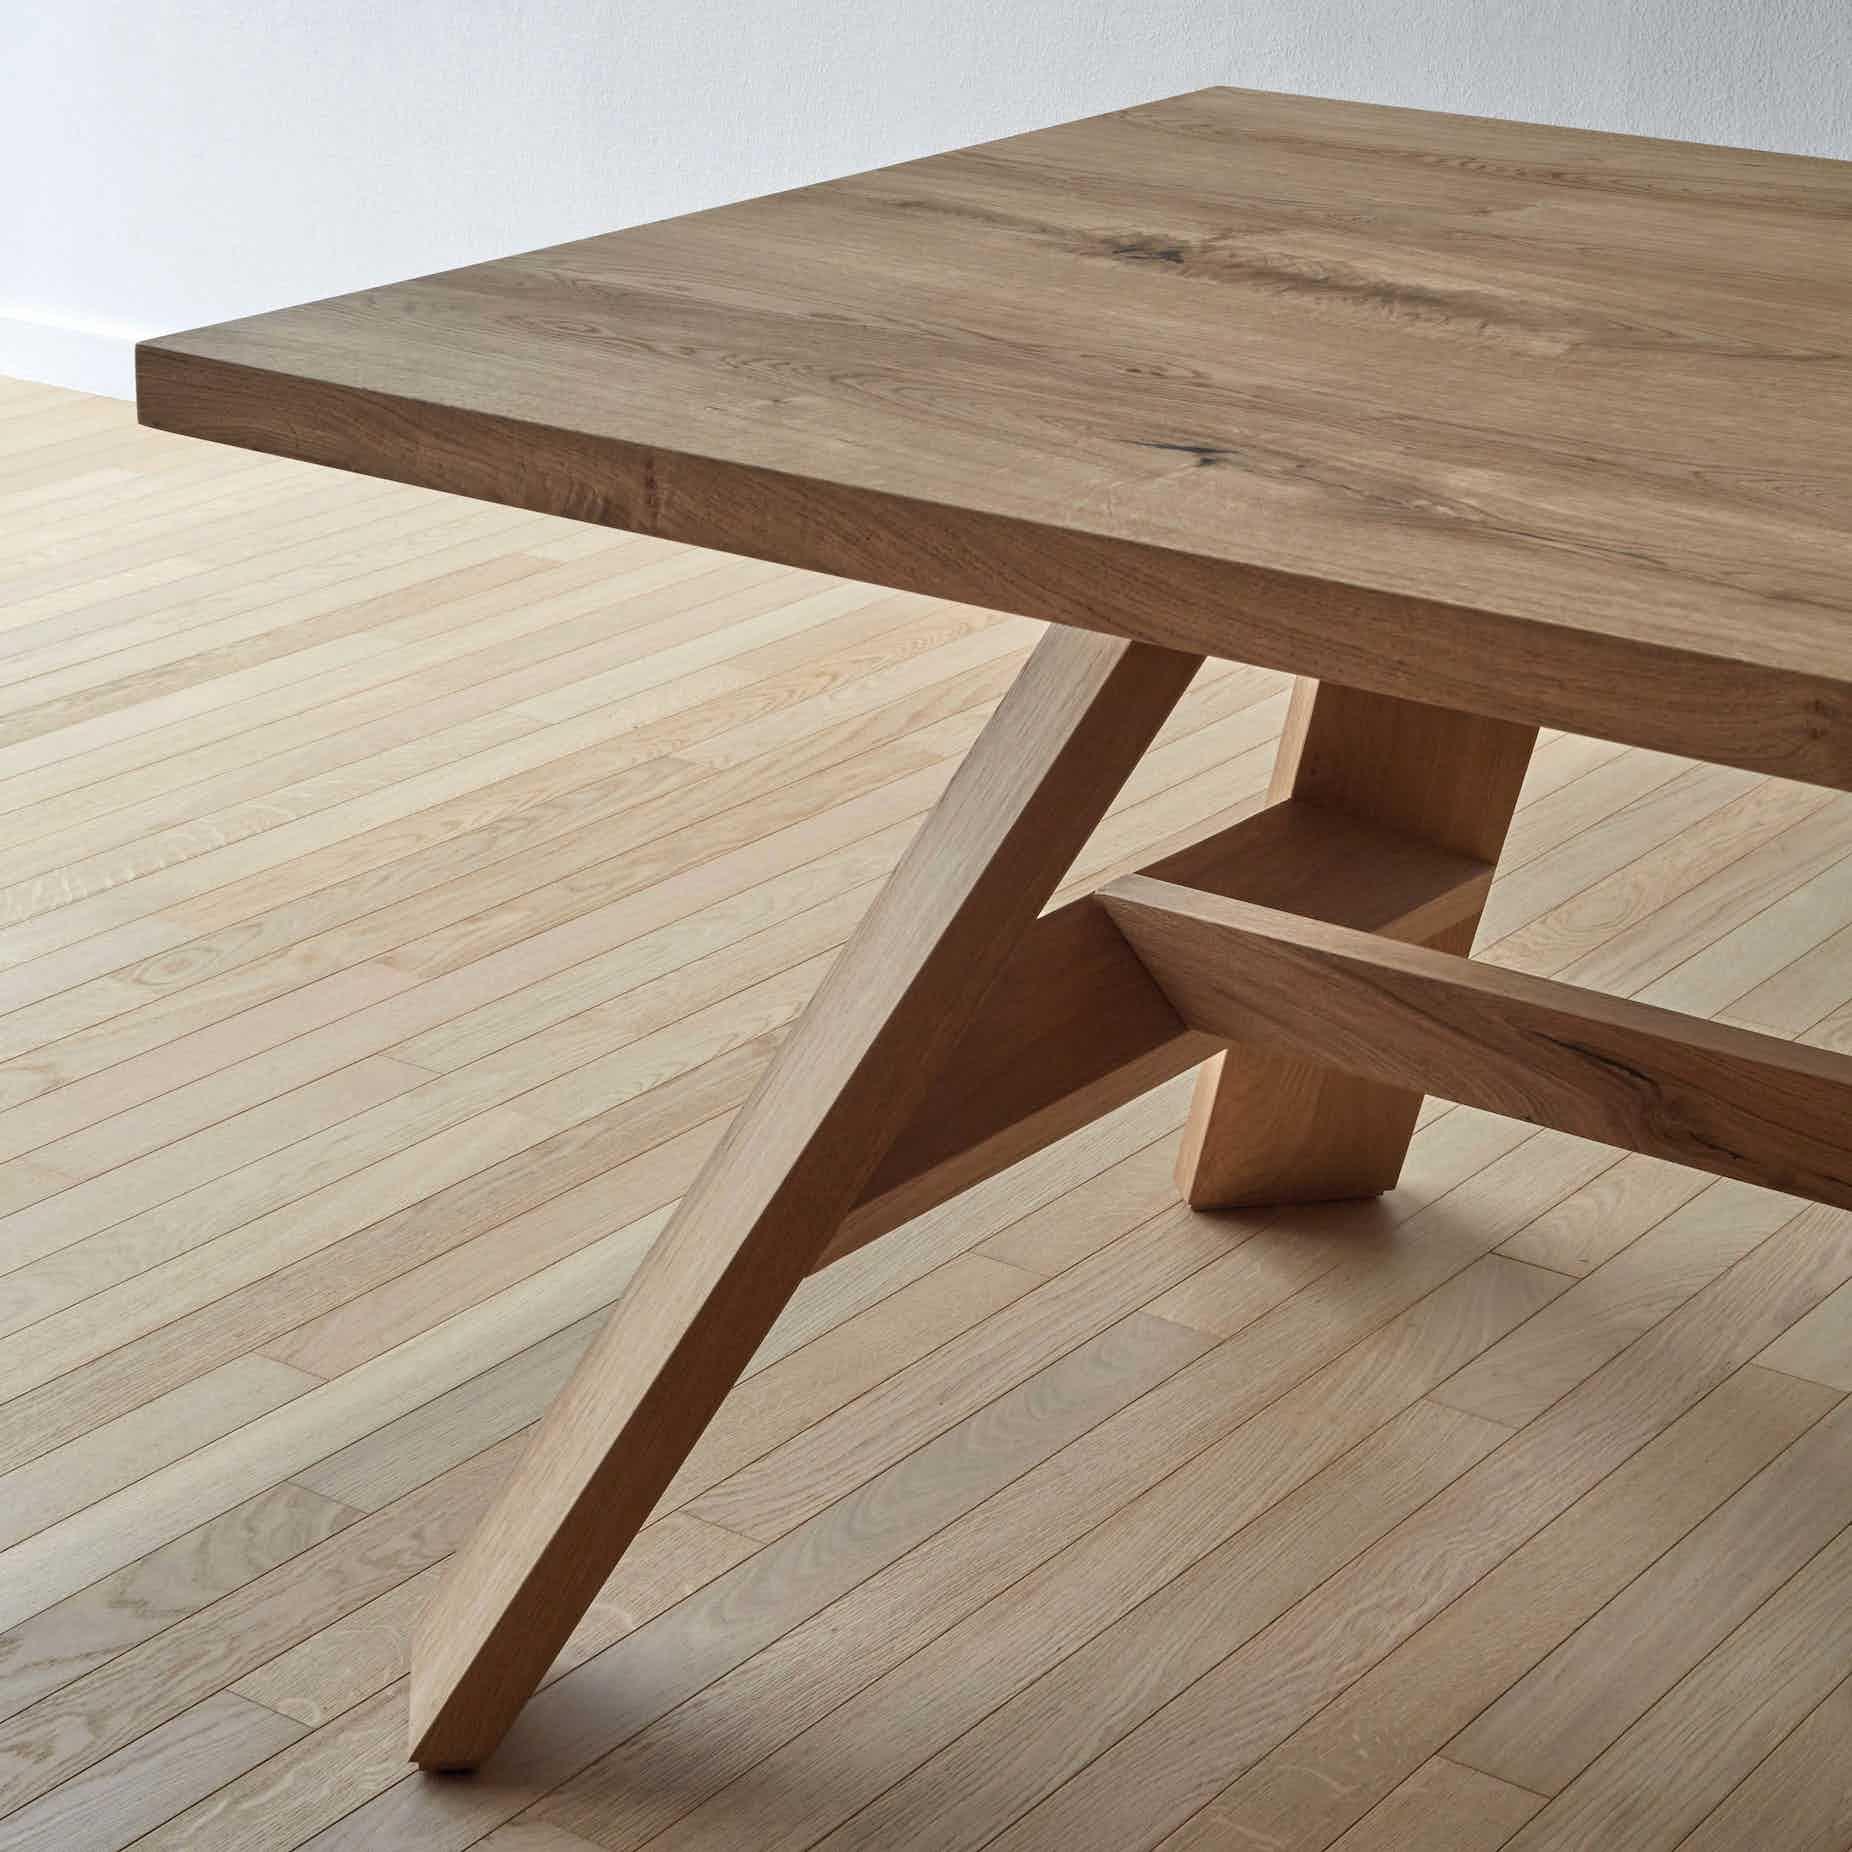 Miniforms Artigiano Table Top Detail Haute Living